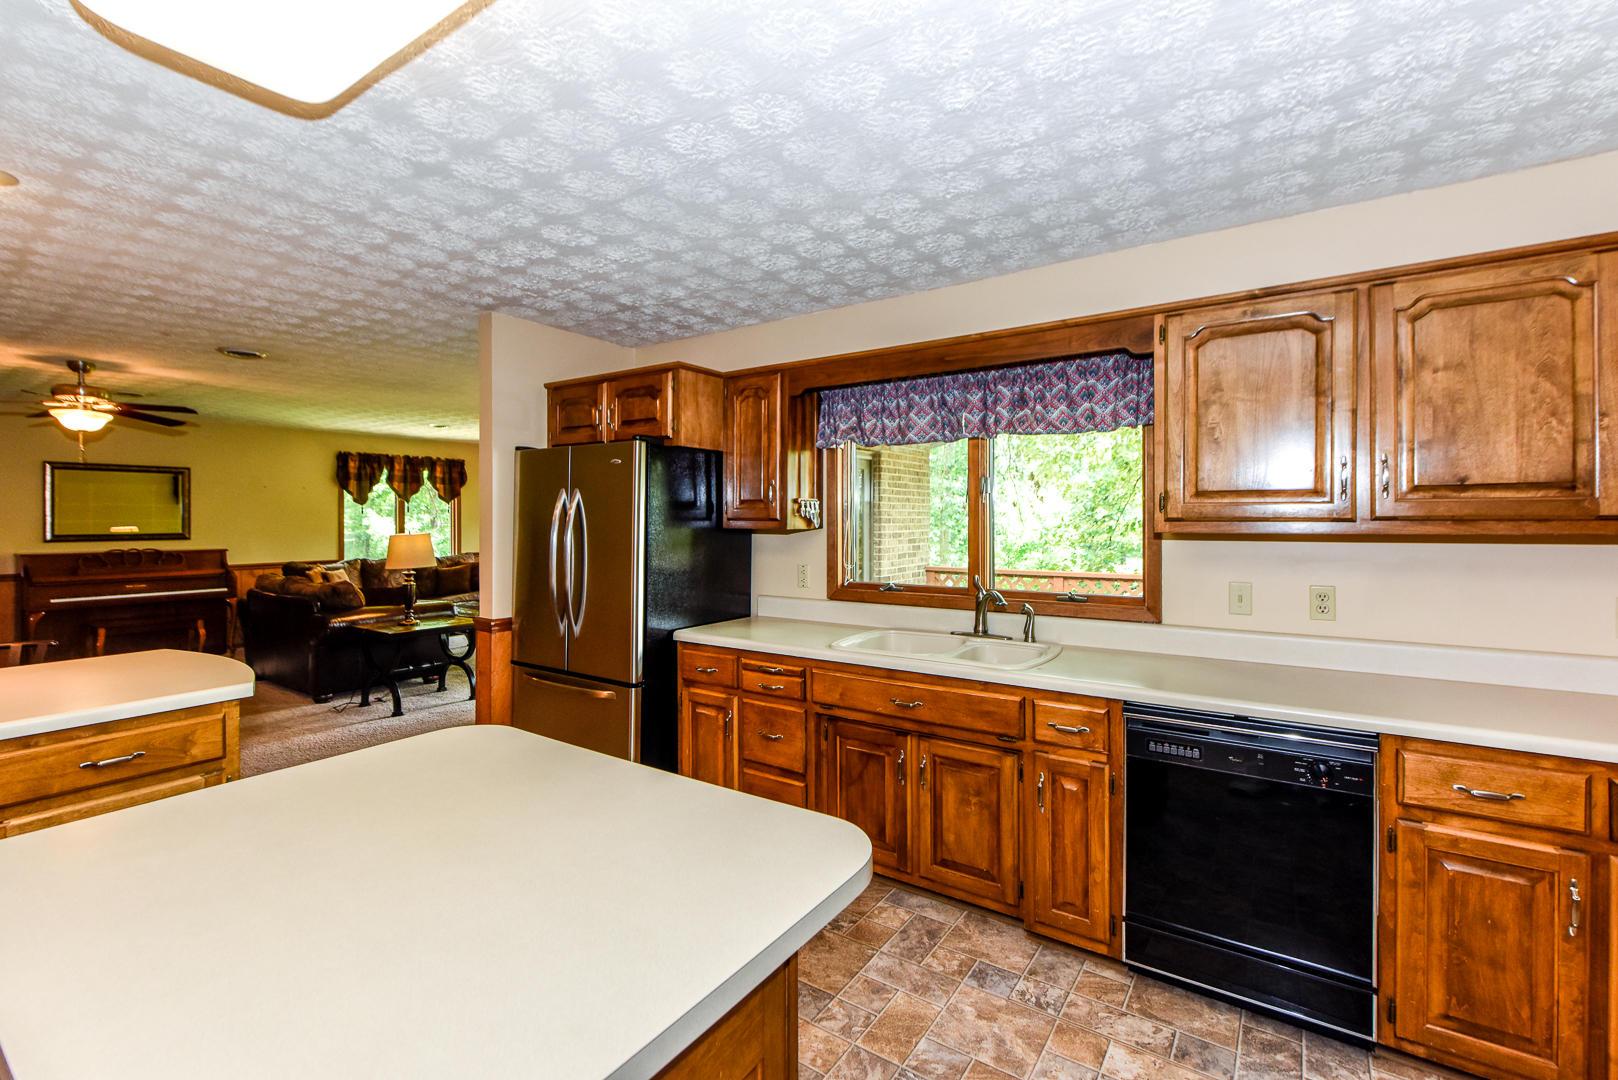 632 Sunrise, Seymour, Tennessee, United States 37865, 4 Bedrooms Bedrooms, ,3 BathroomsBathrooms,Single Family,For Sale,Sunrise,1053524